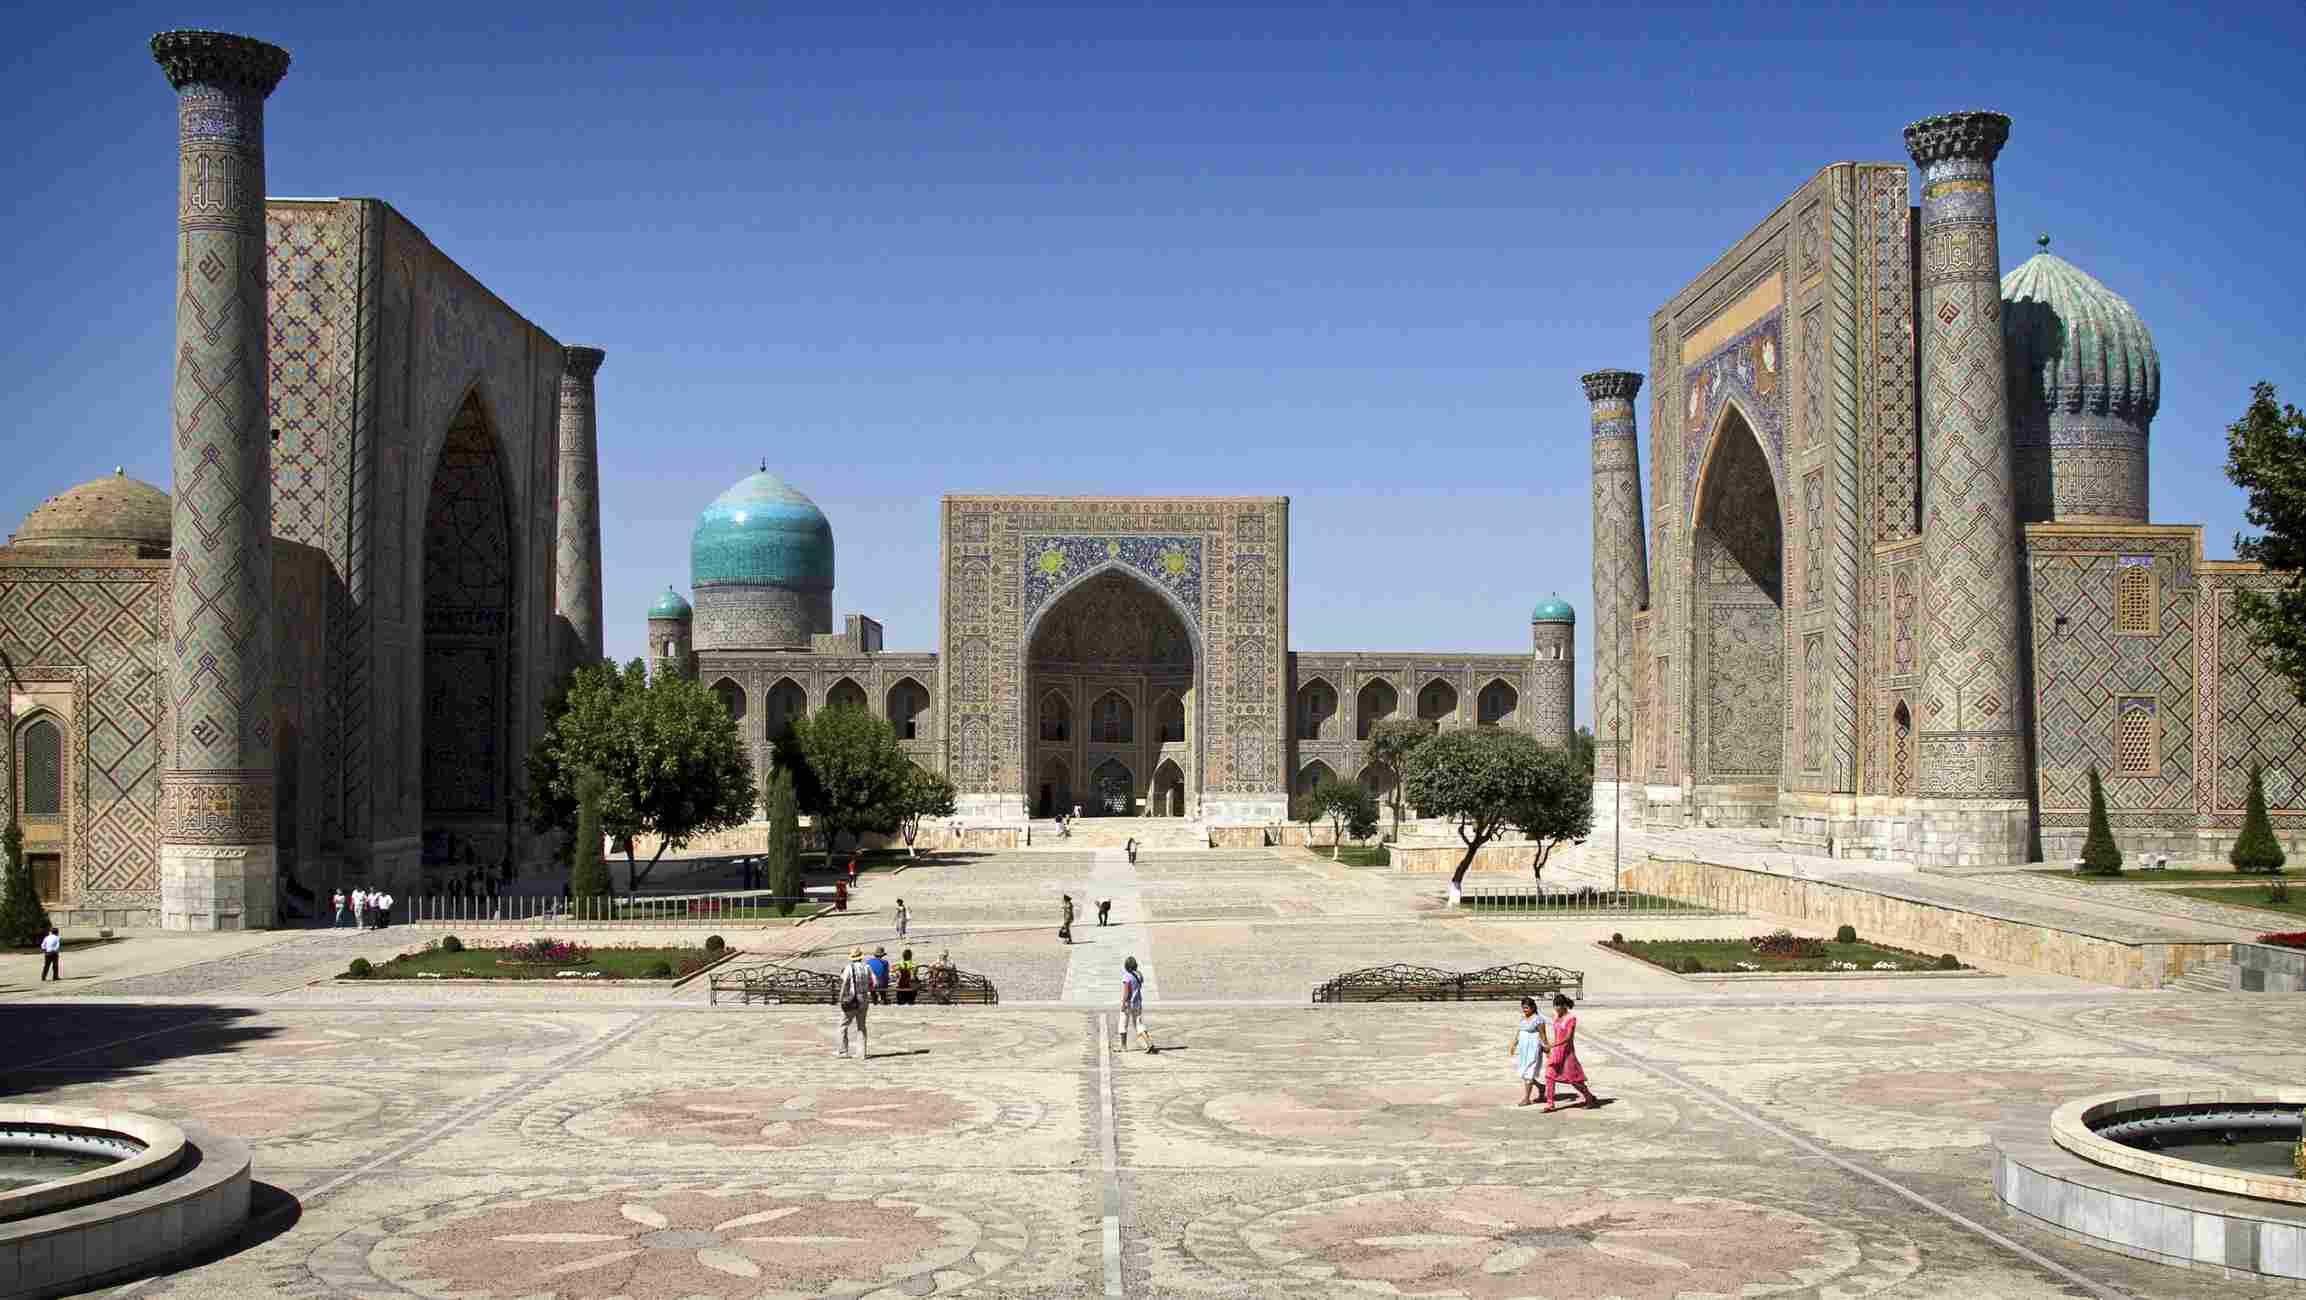 The three madrasahs of Registan Square